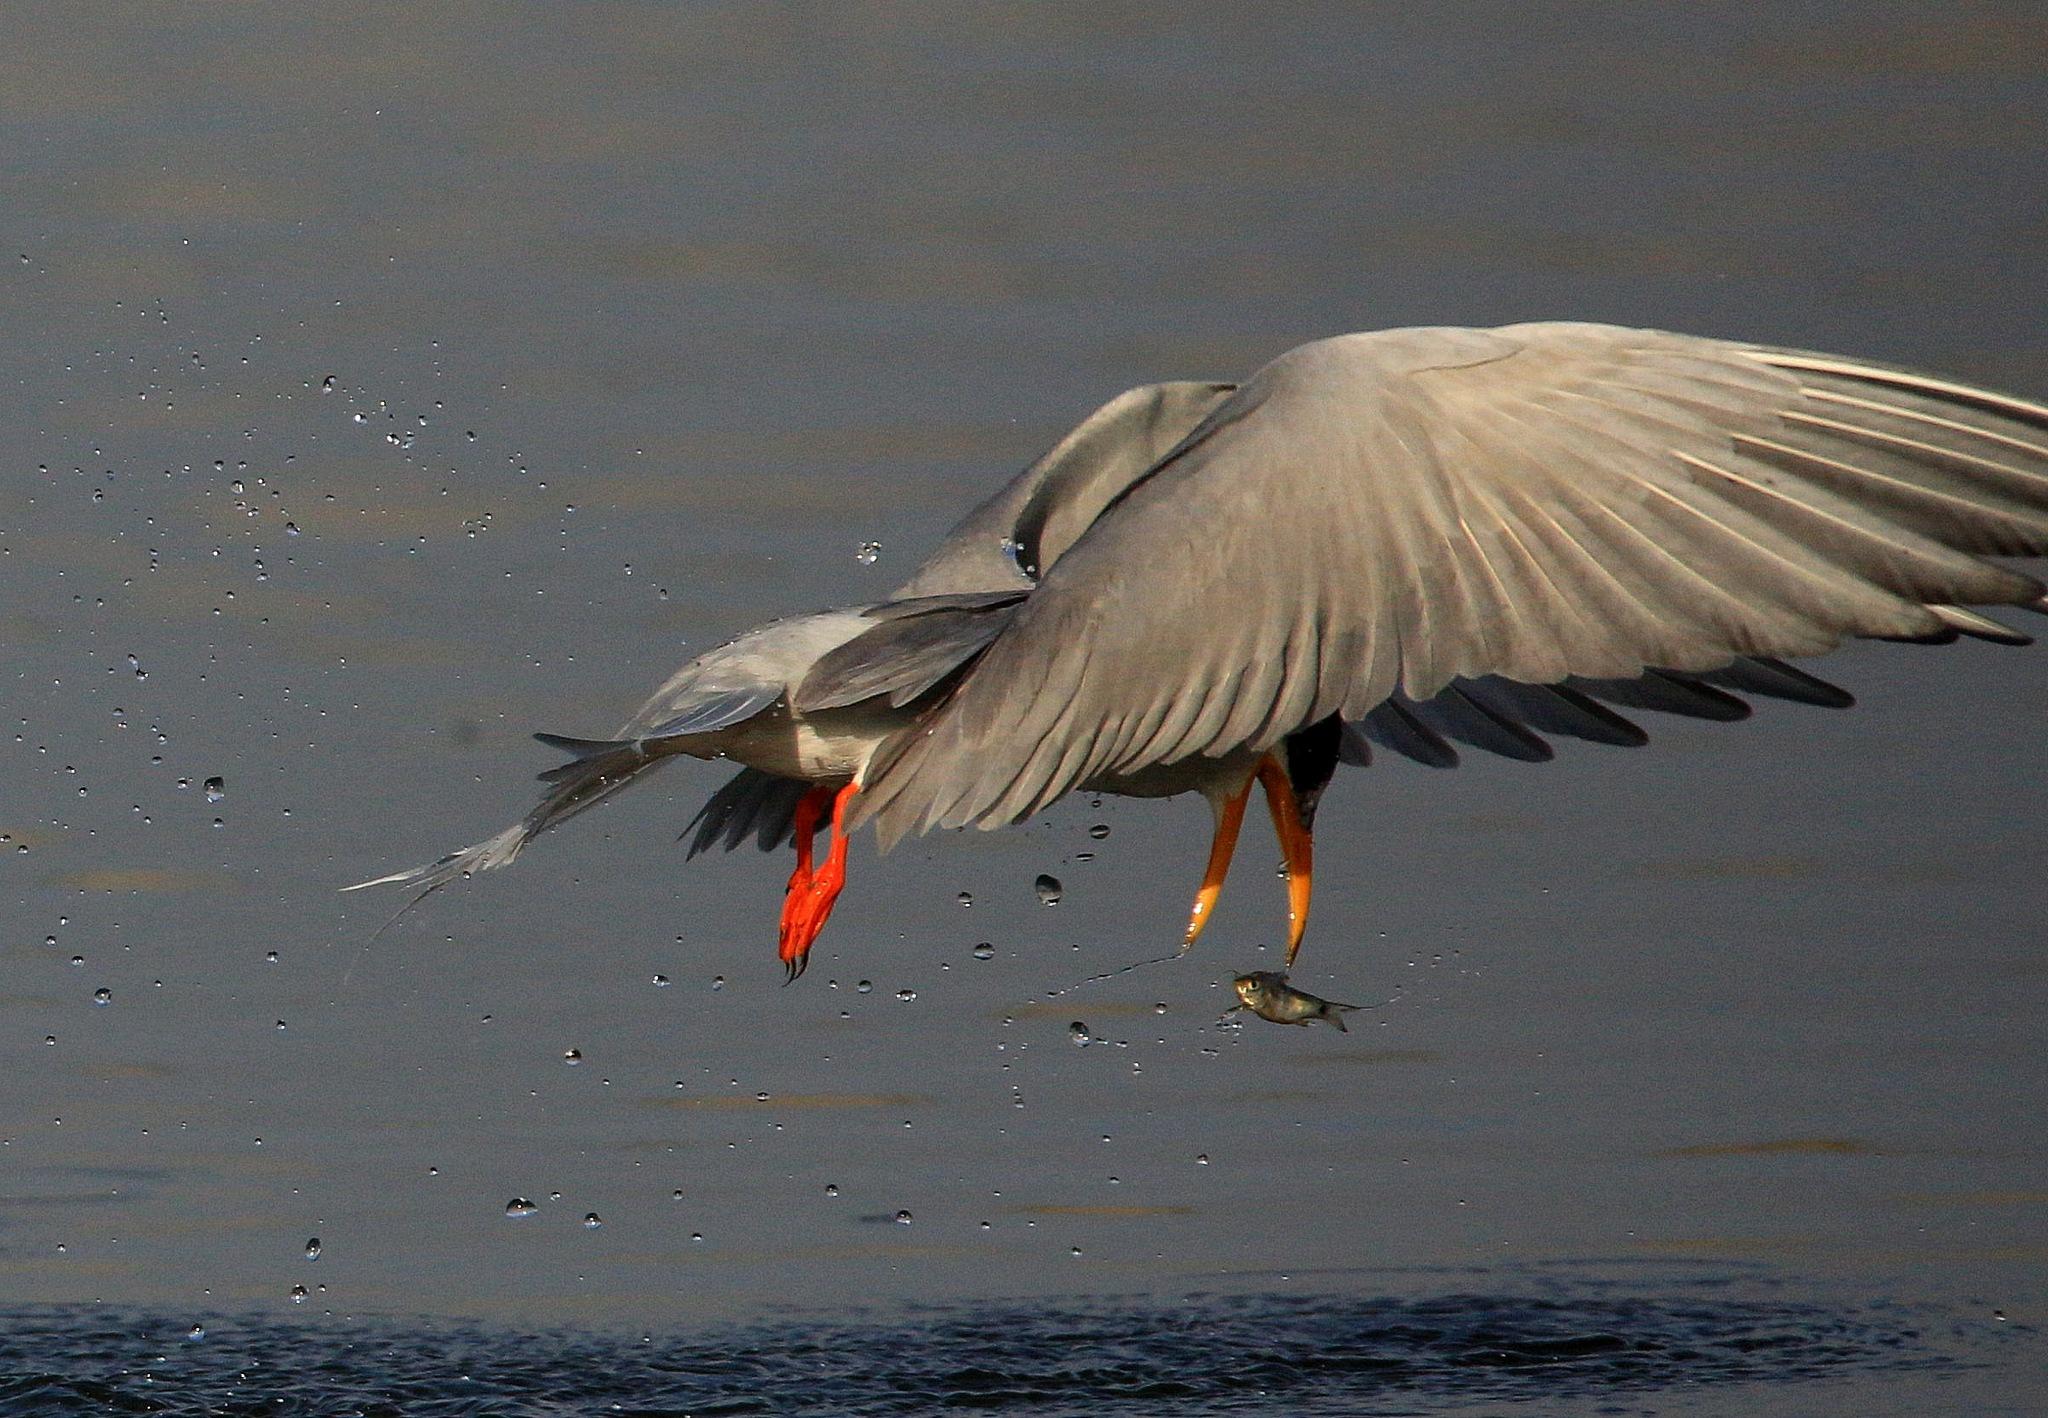 Fish by Kishan Meena